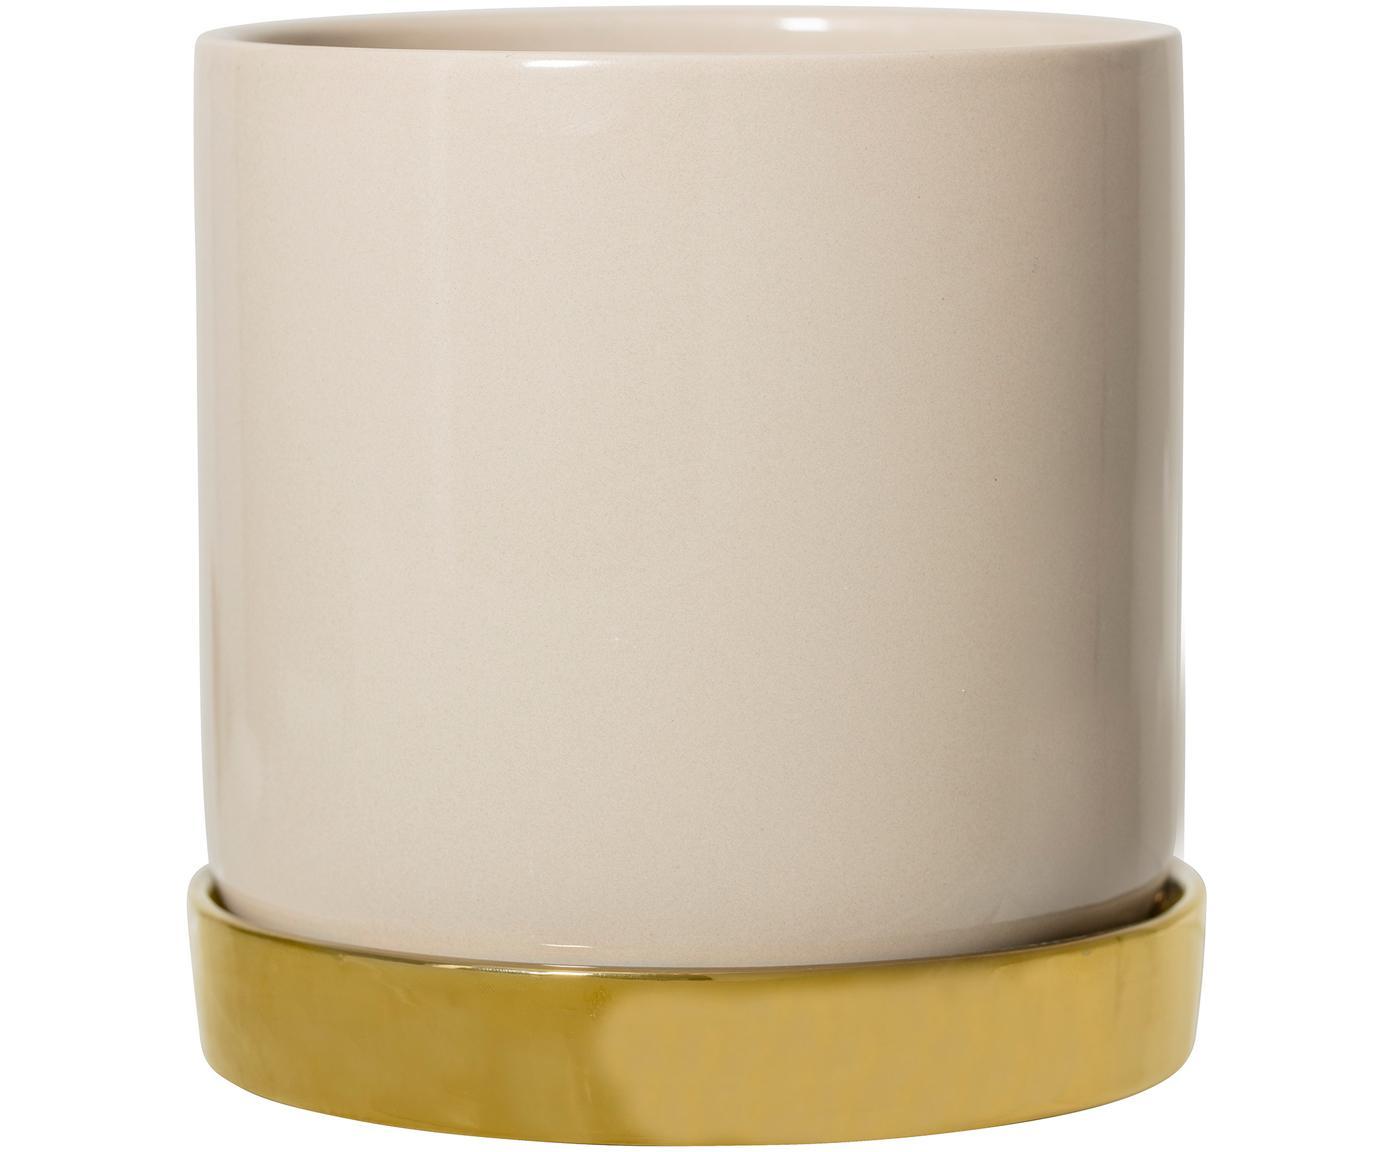 Plantenpot Elin, Keramiek, Pot: beige. Onderzetter: goudkleurig, Ø 14 x H 14 cm